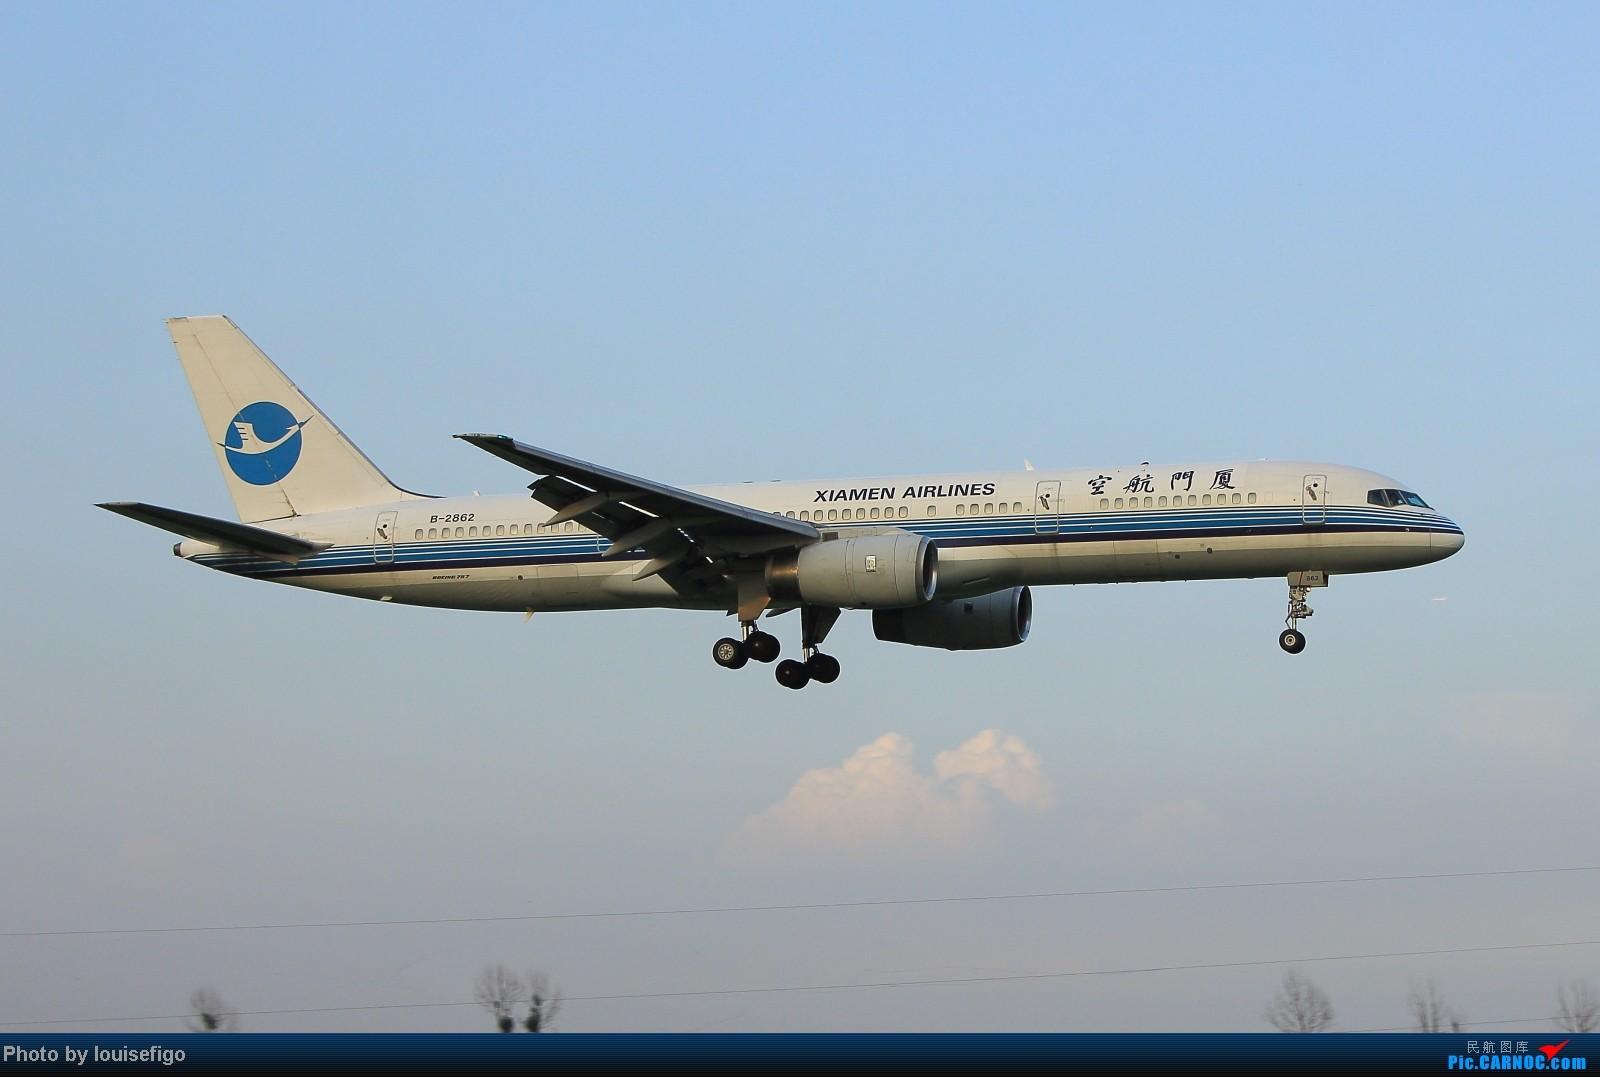 Re:[原创]闲来无事天气闷,发点冷饭自娱乐!!!PEK西跑的降落杂图~发到哪儿是哪儿啊!随心情! BOEING 757-200 B-2862 北京首都国际机场